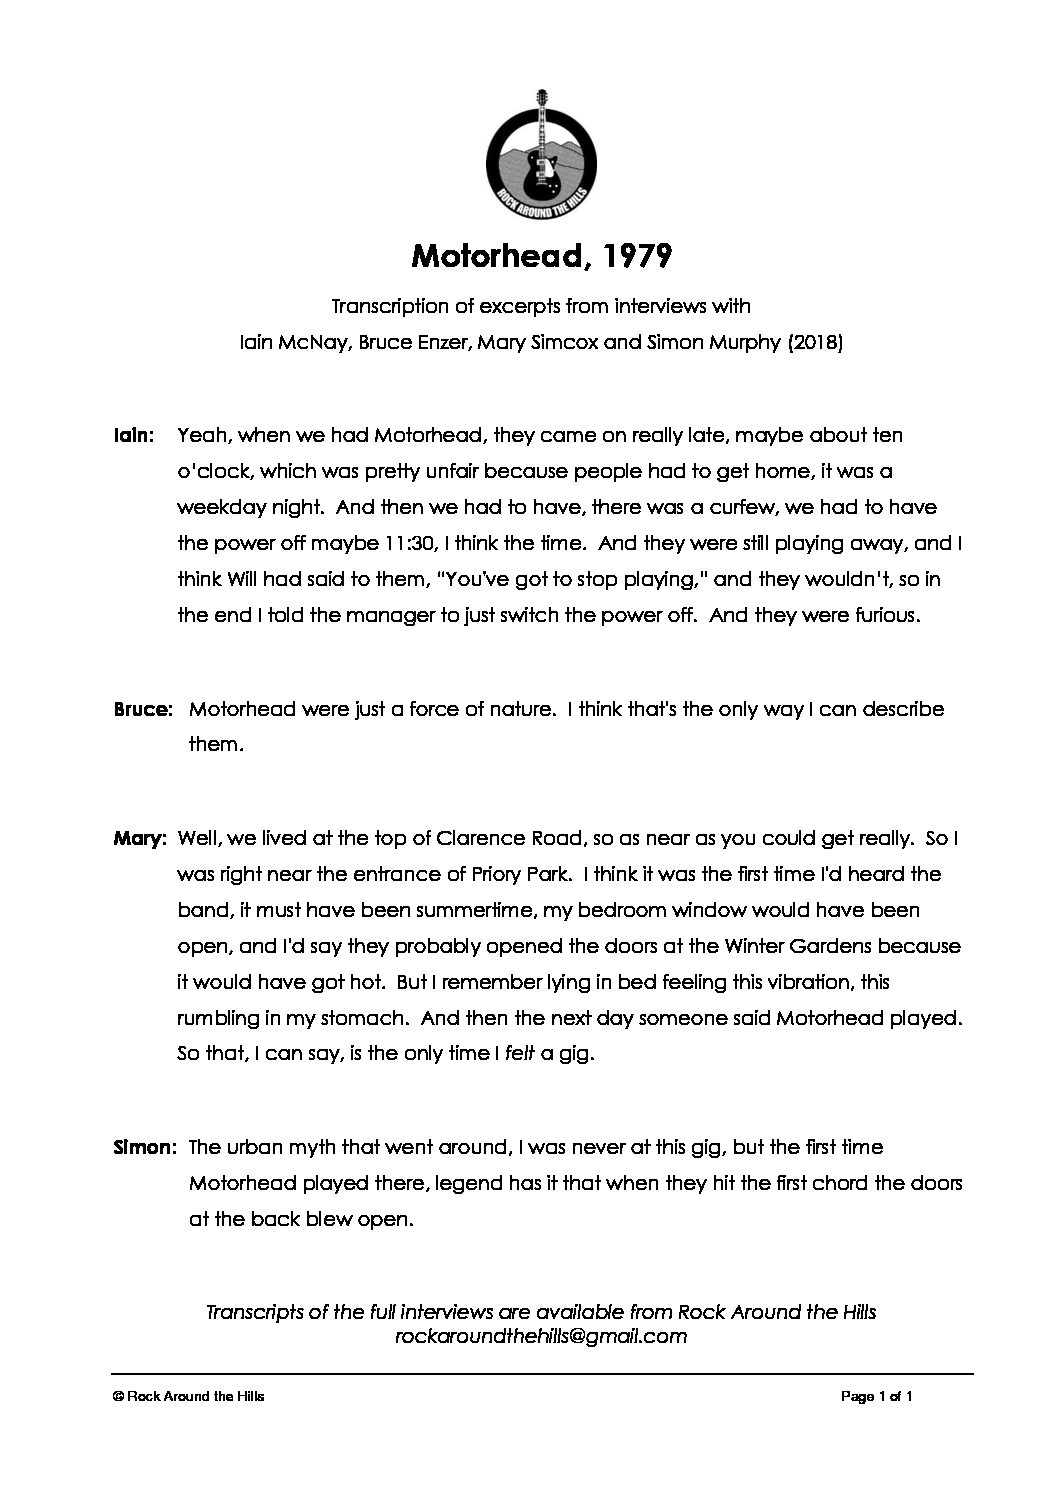 Memories of Motorhead at Malvern Winter Gardens, 1979